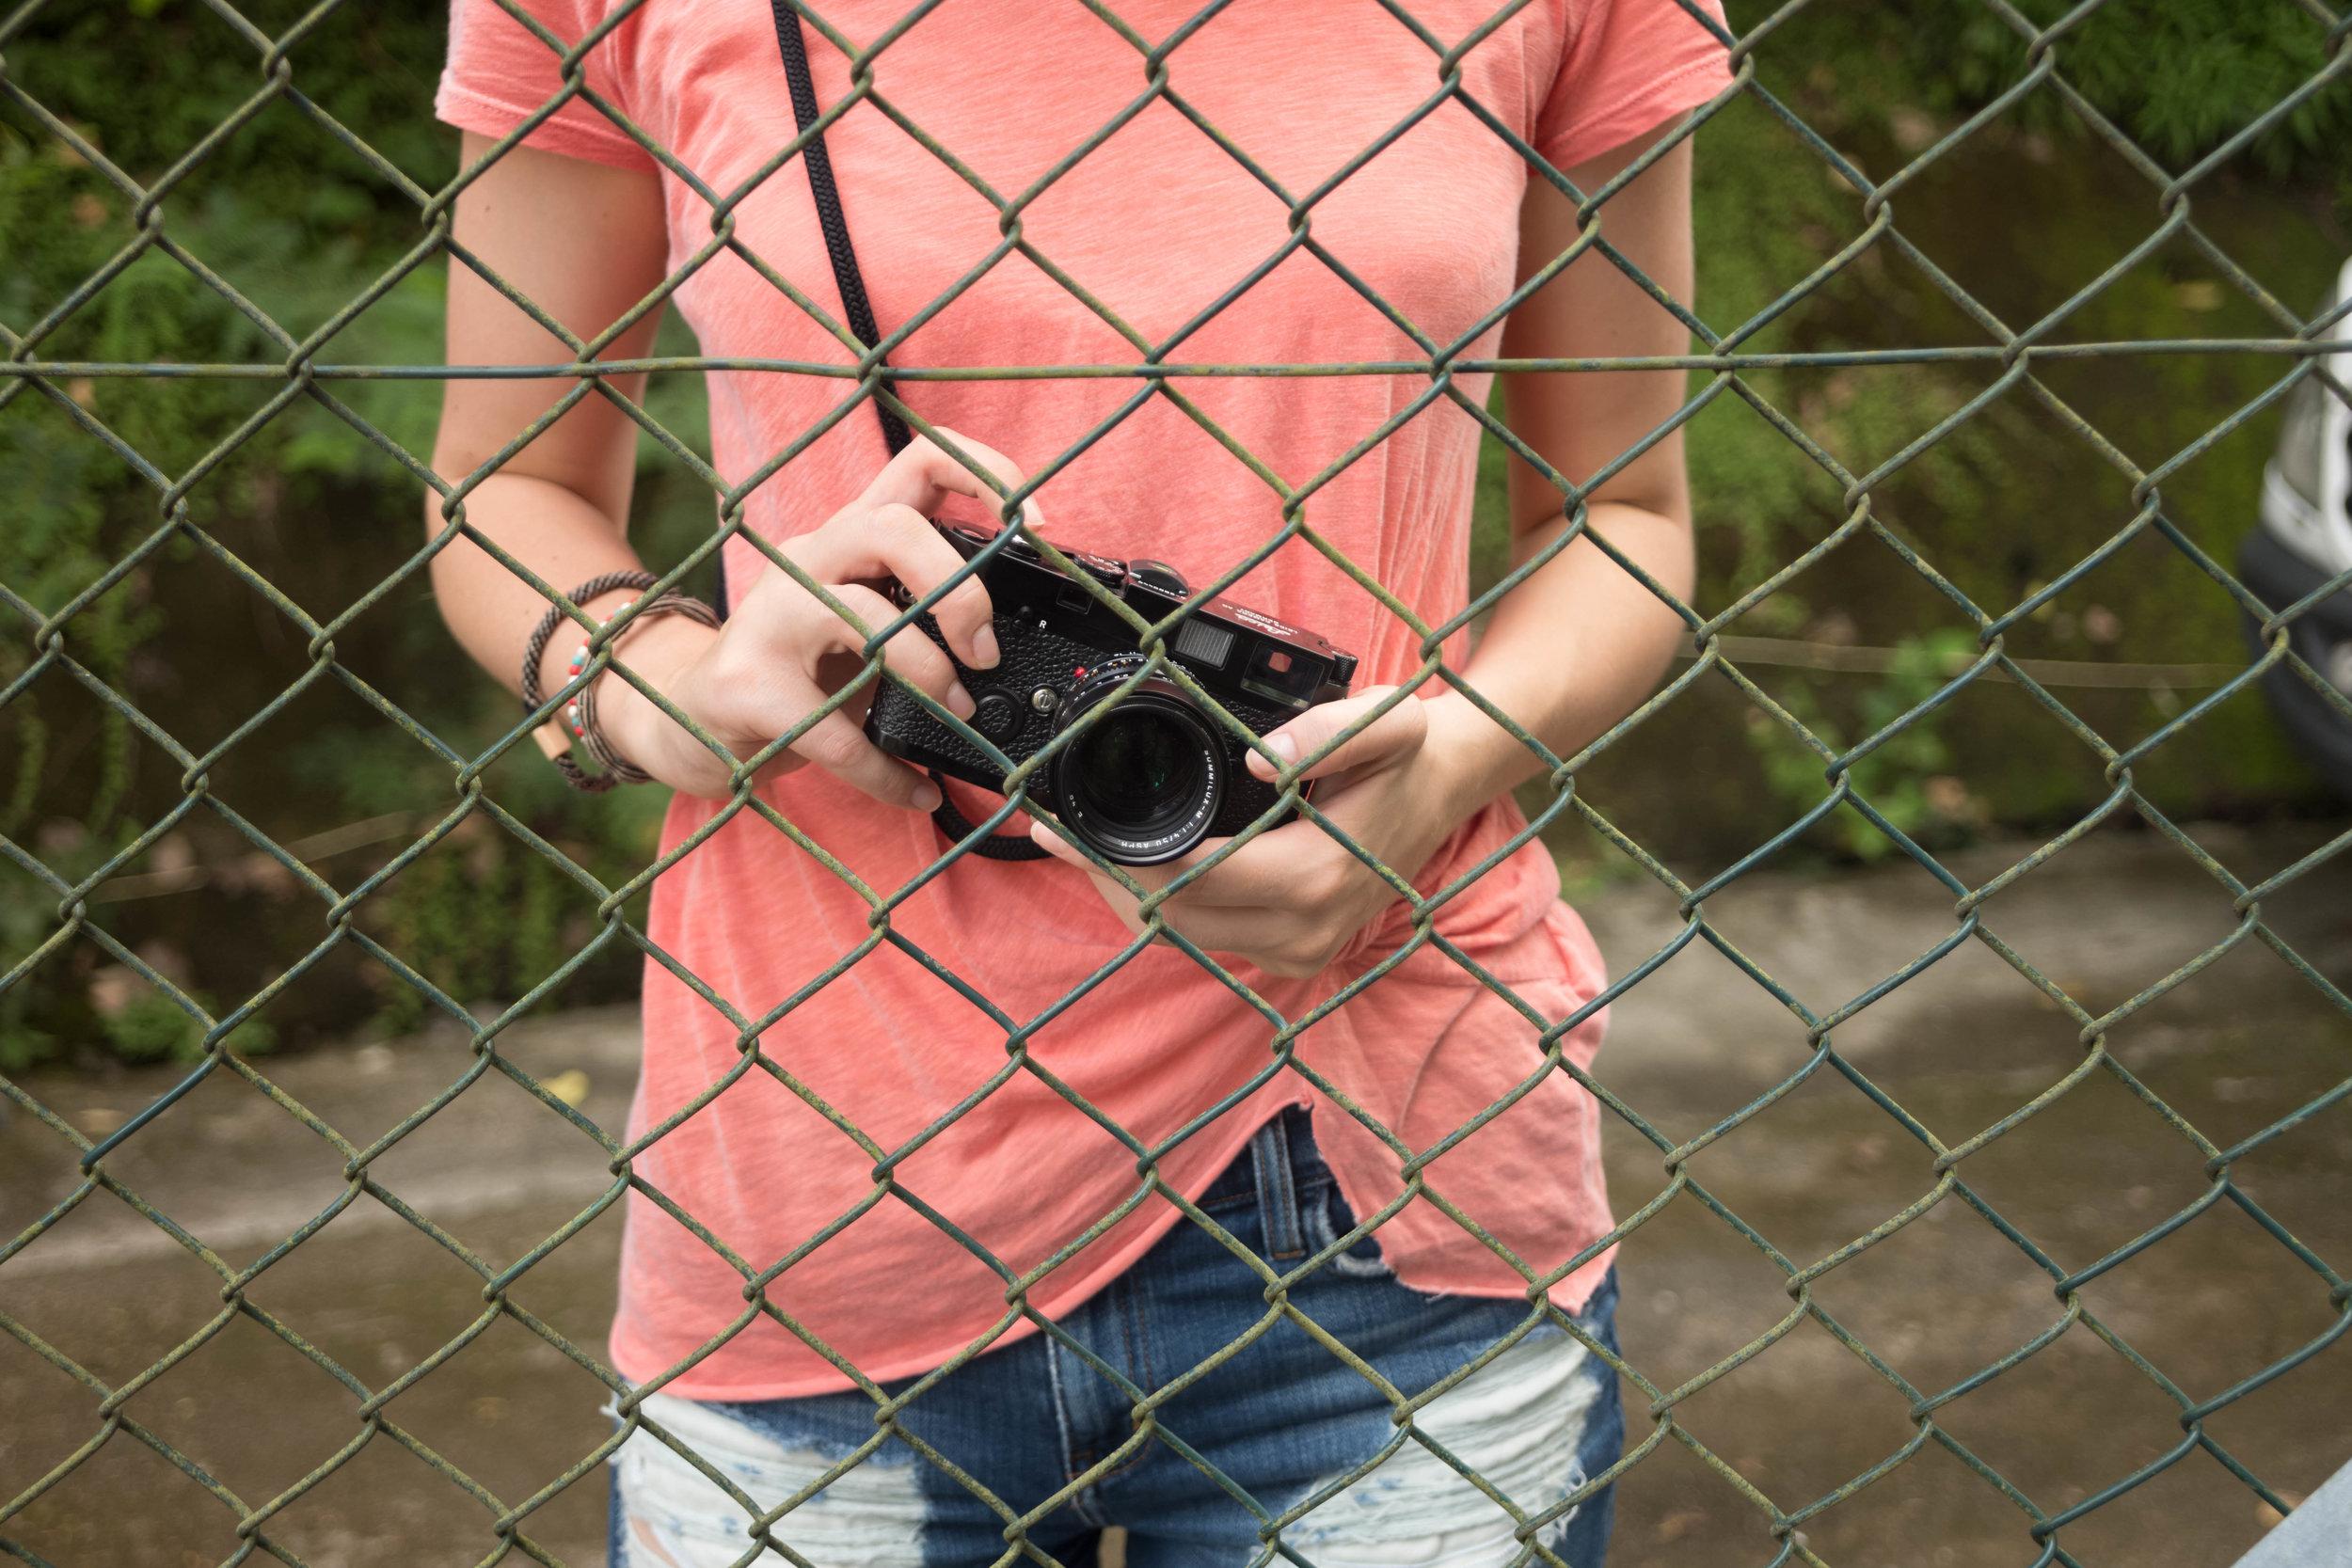 Leica M10 + Leica 28-35-50mm f/4 Tri-Elmar-M ASPH @35mm